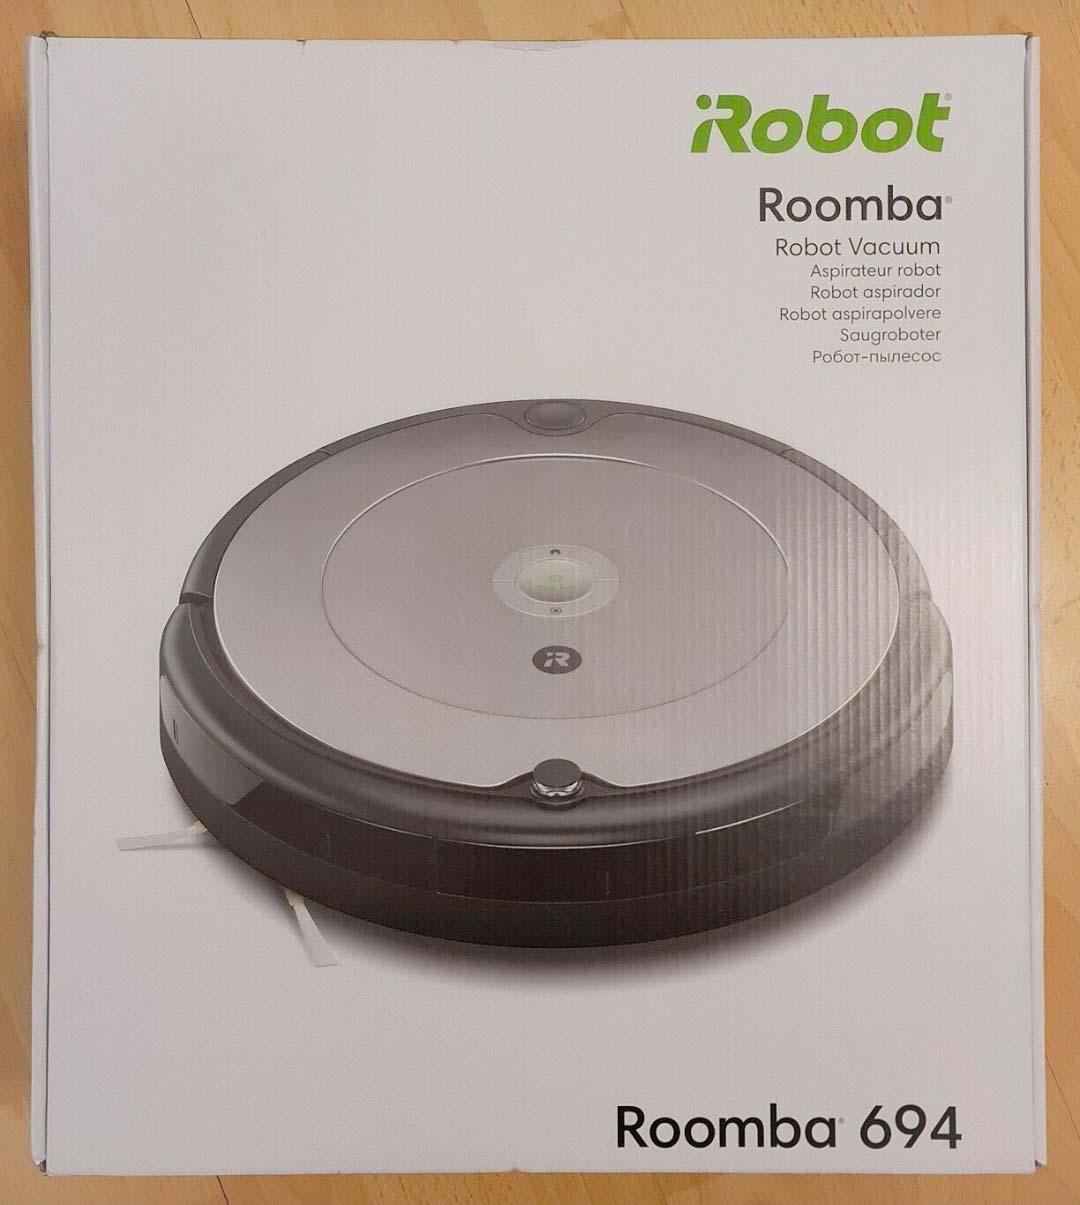 Die unspektakuläre Verpackung des iRobot Roomba 694 Saugroboters.